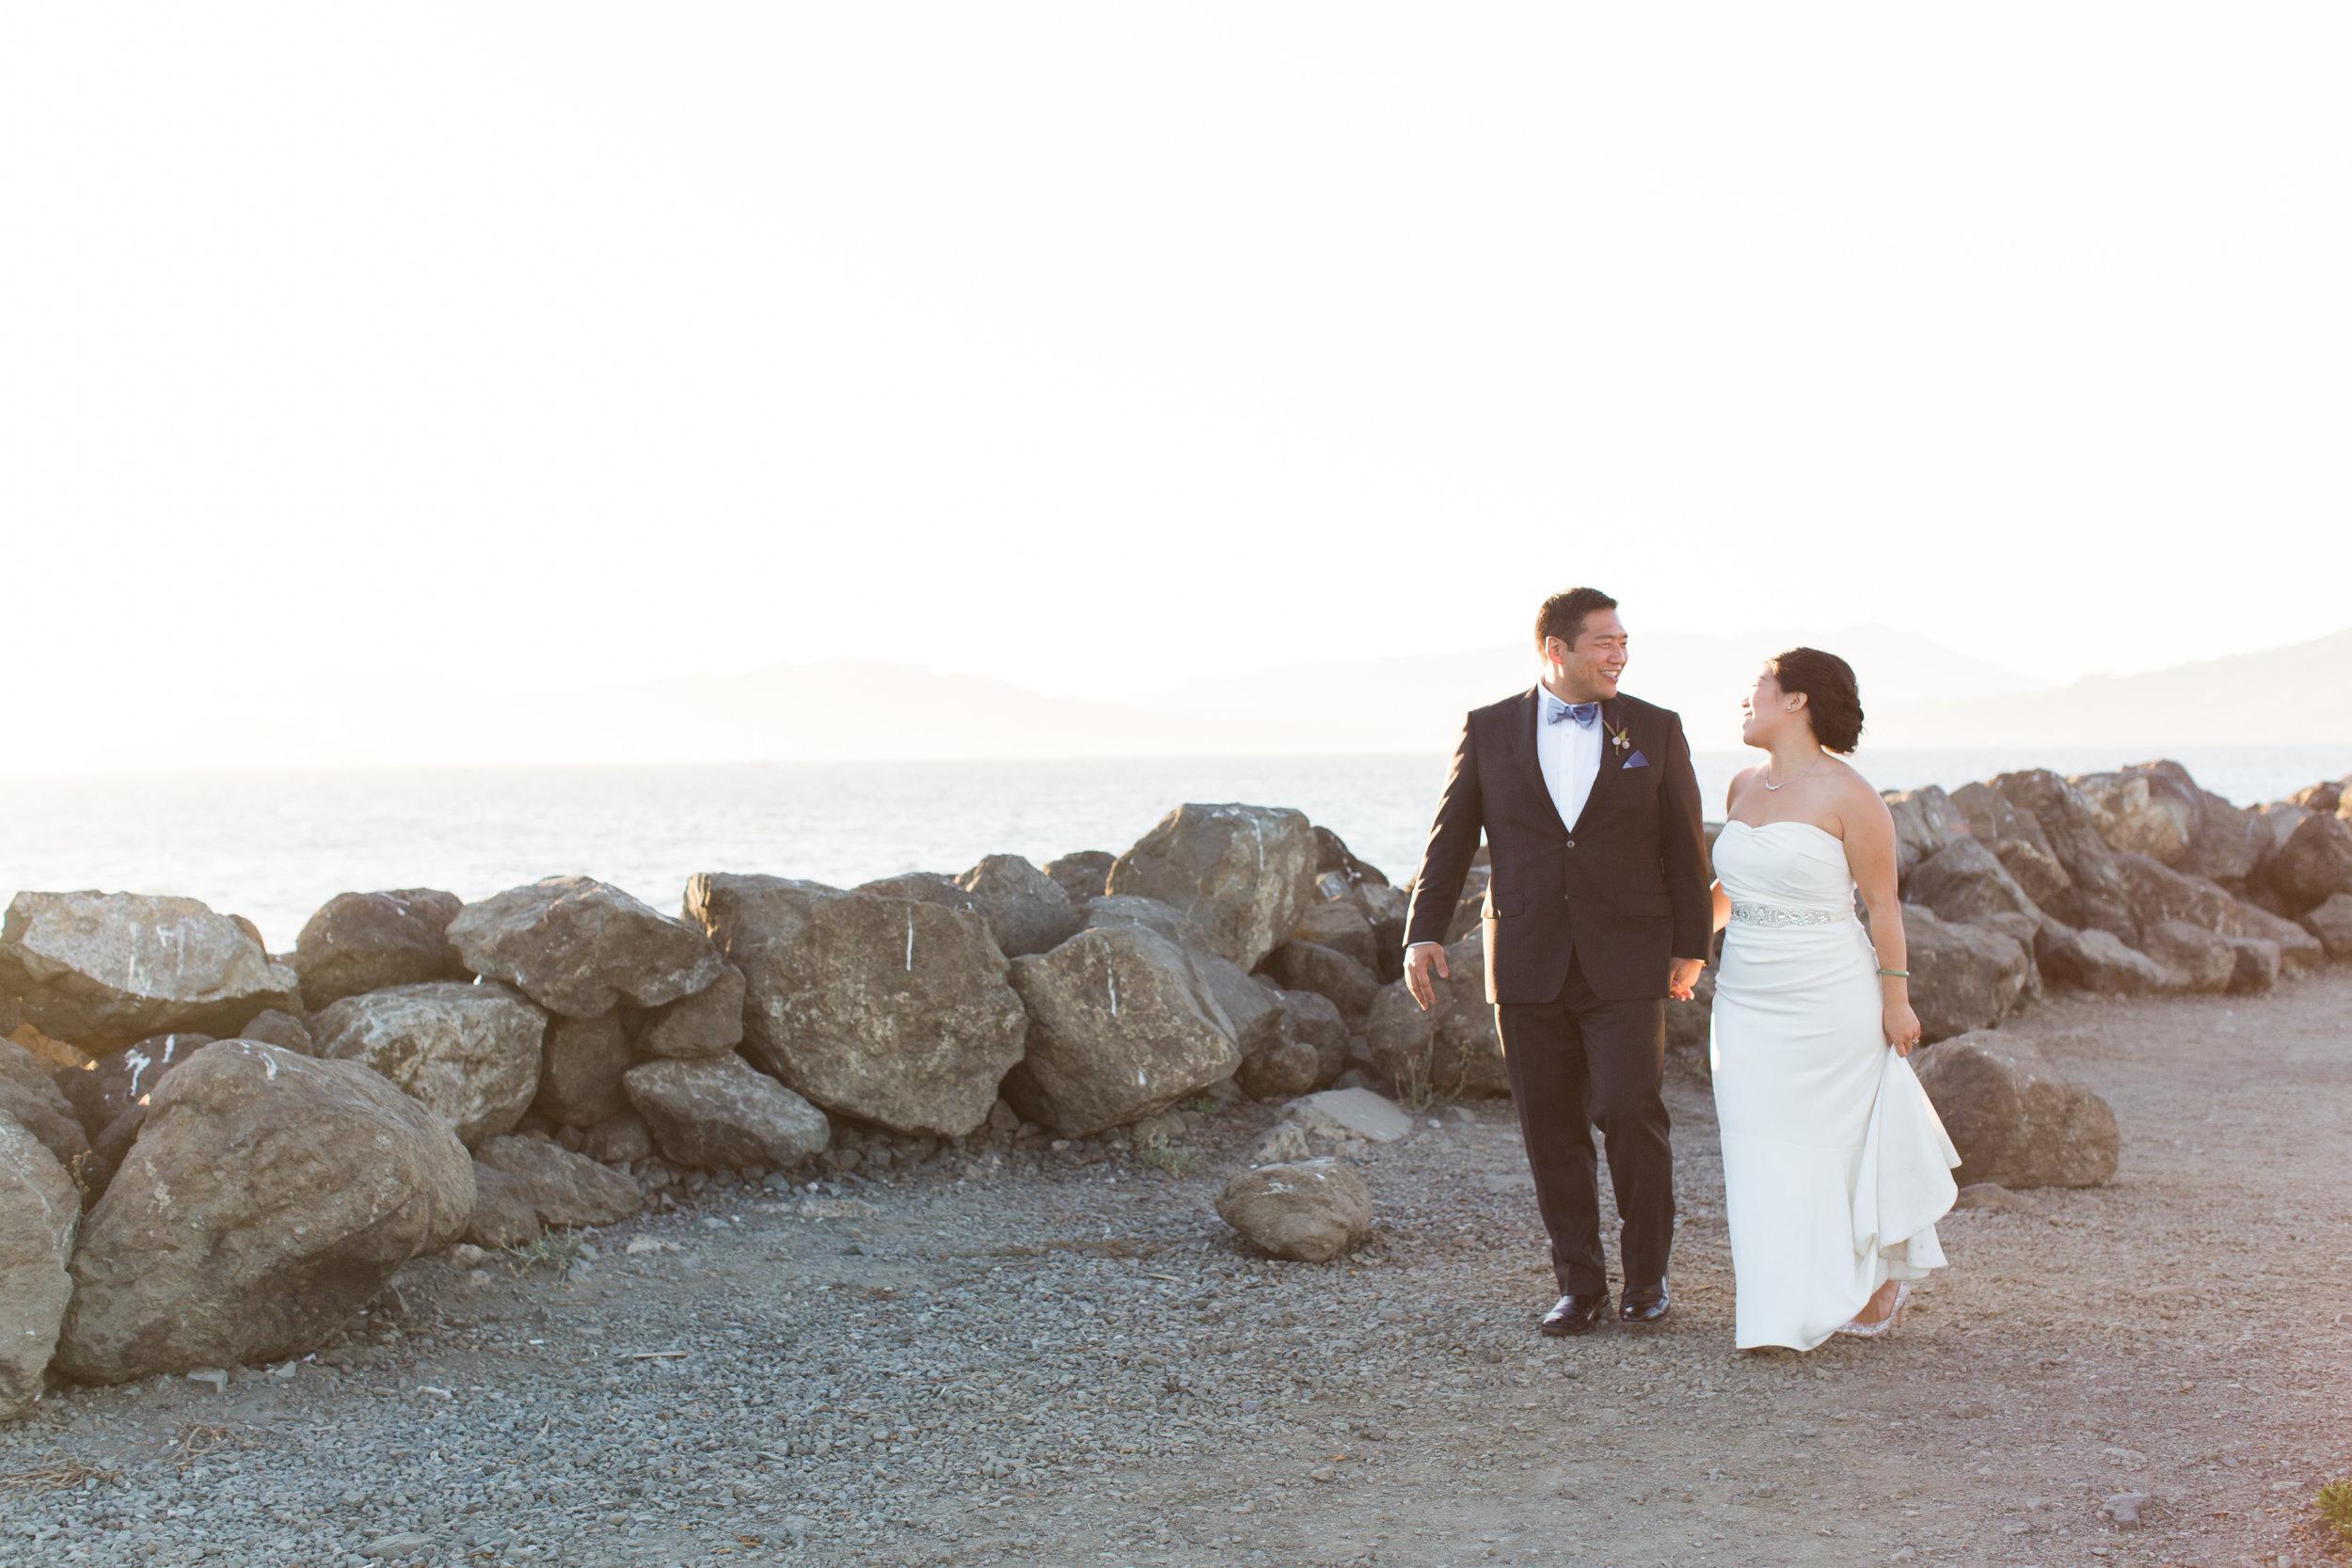 romantic-aracely-cafe-wedding-treasure-island-104.jpg